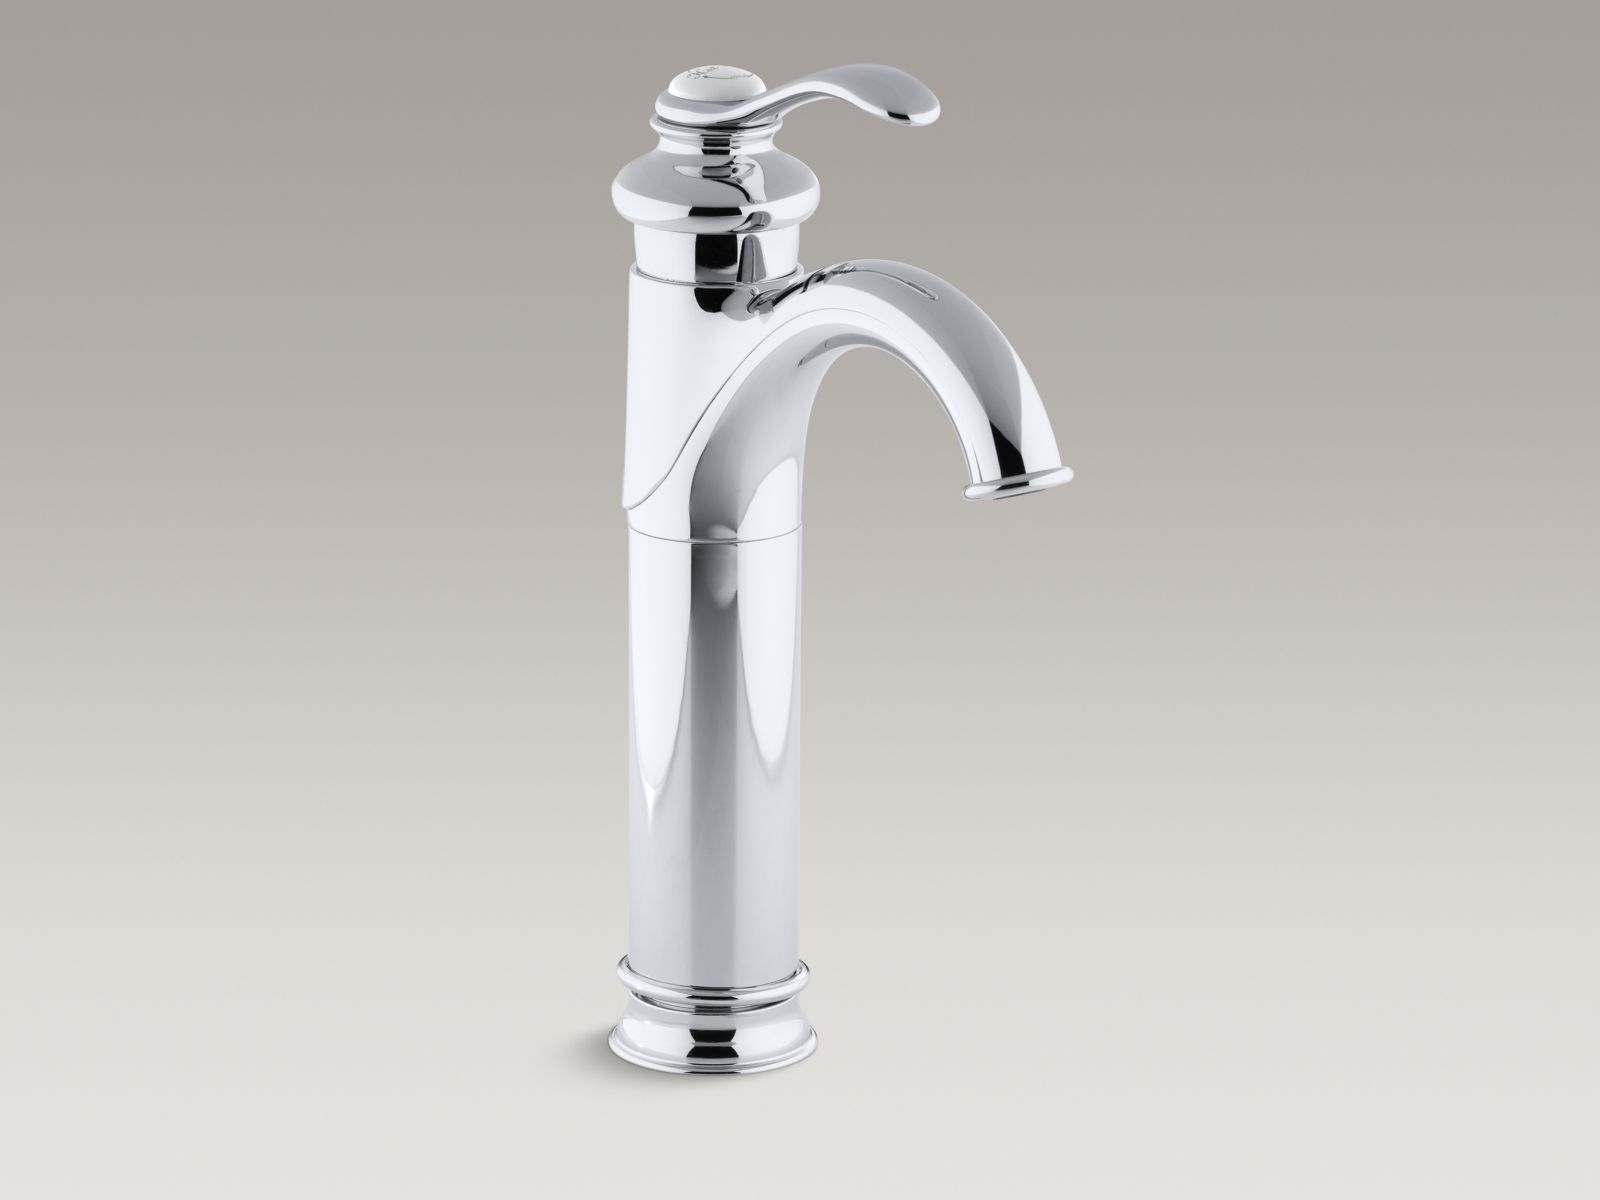 kohler bol ceramic faucet kohler bol ceramic faucet single handle bathroom faucet wave single handle bathroom faucet 1600 x 1200